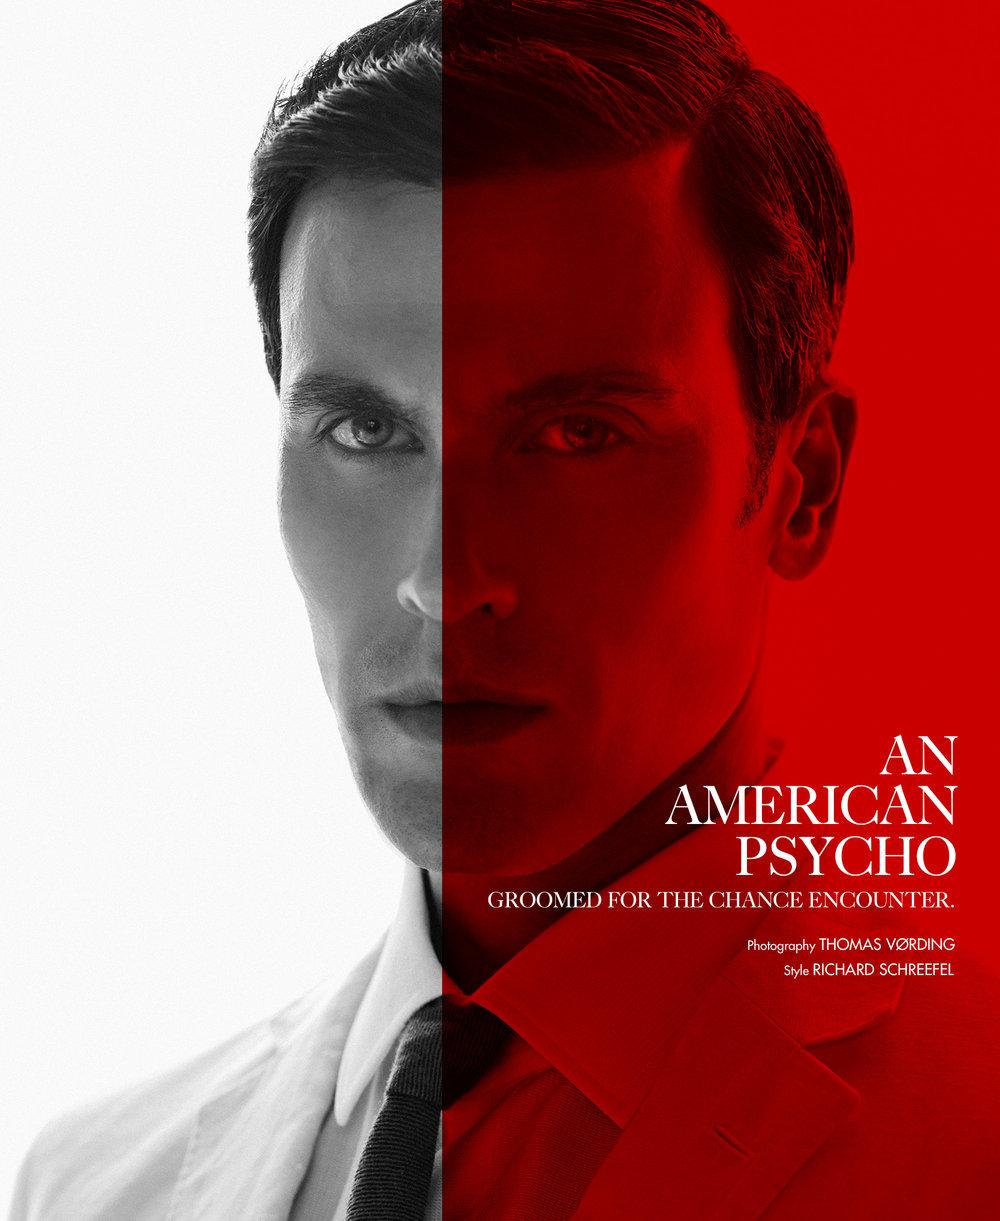 americanpsycho-thumb.jpg